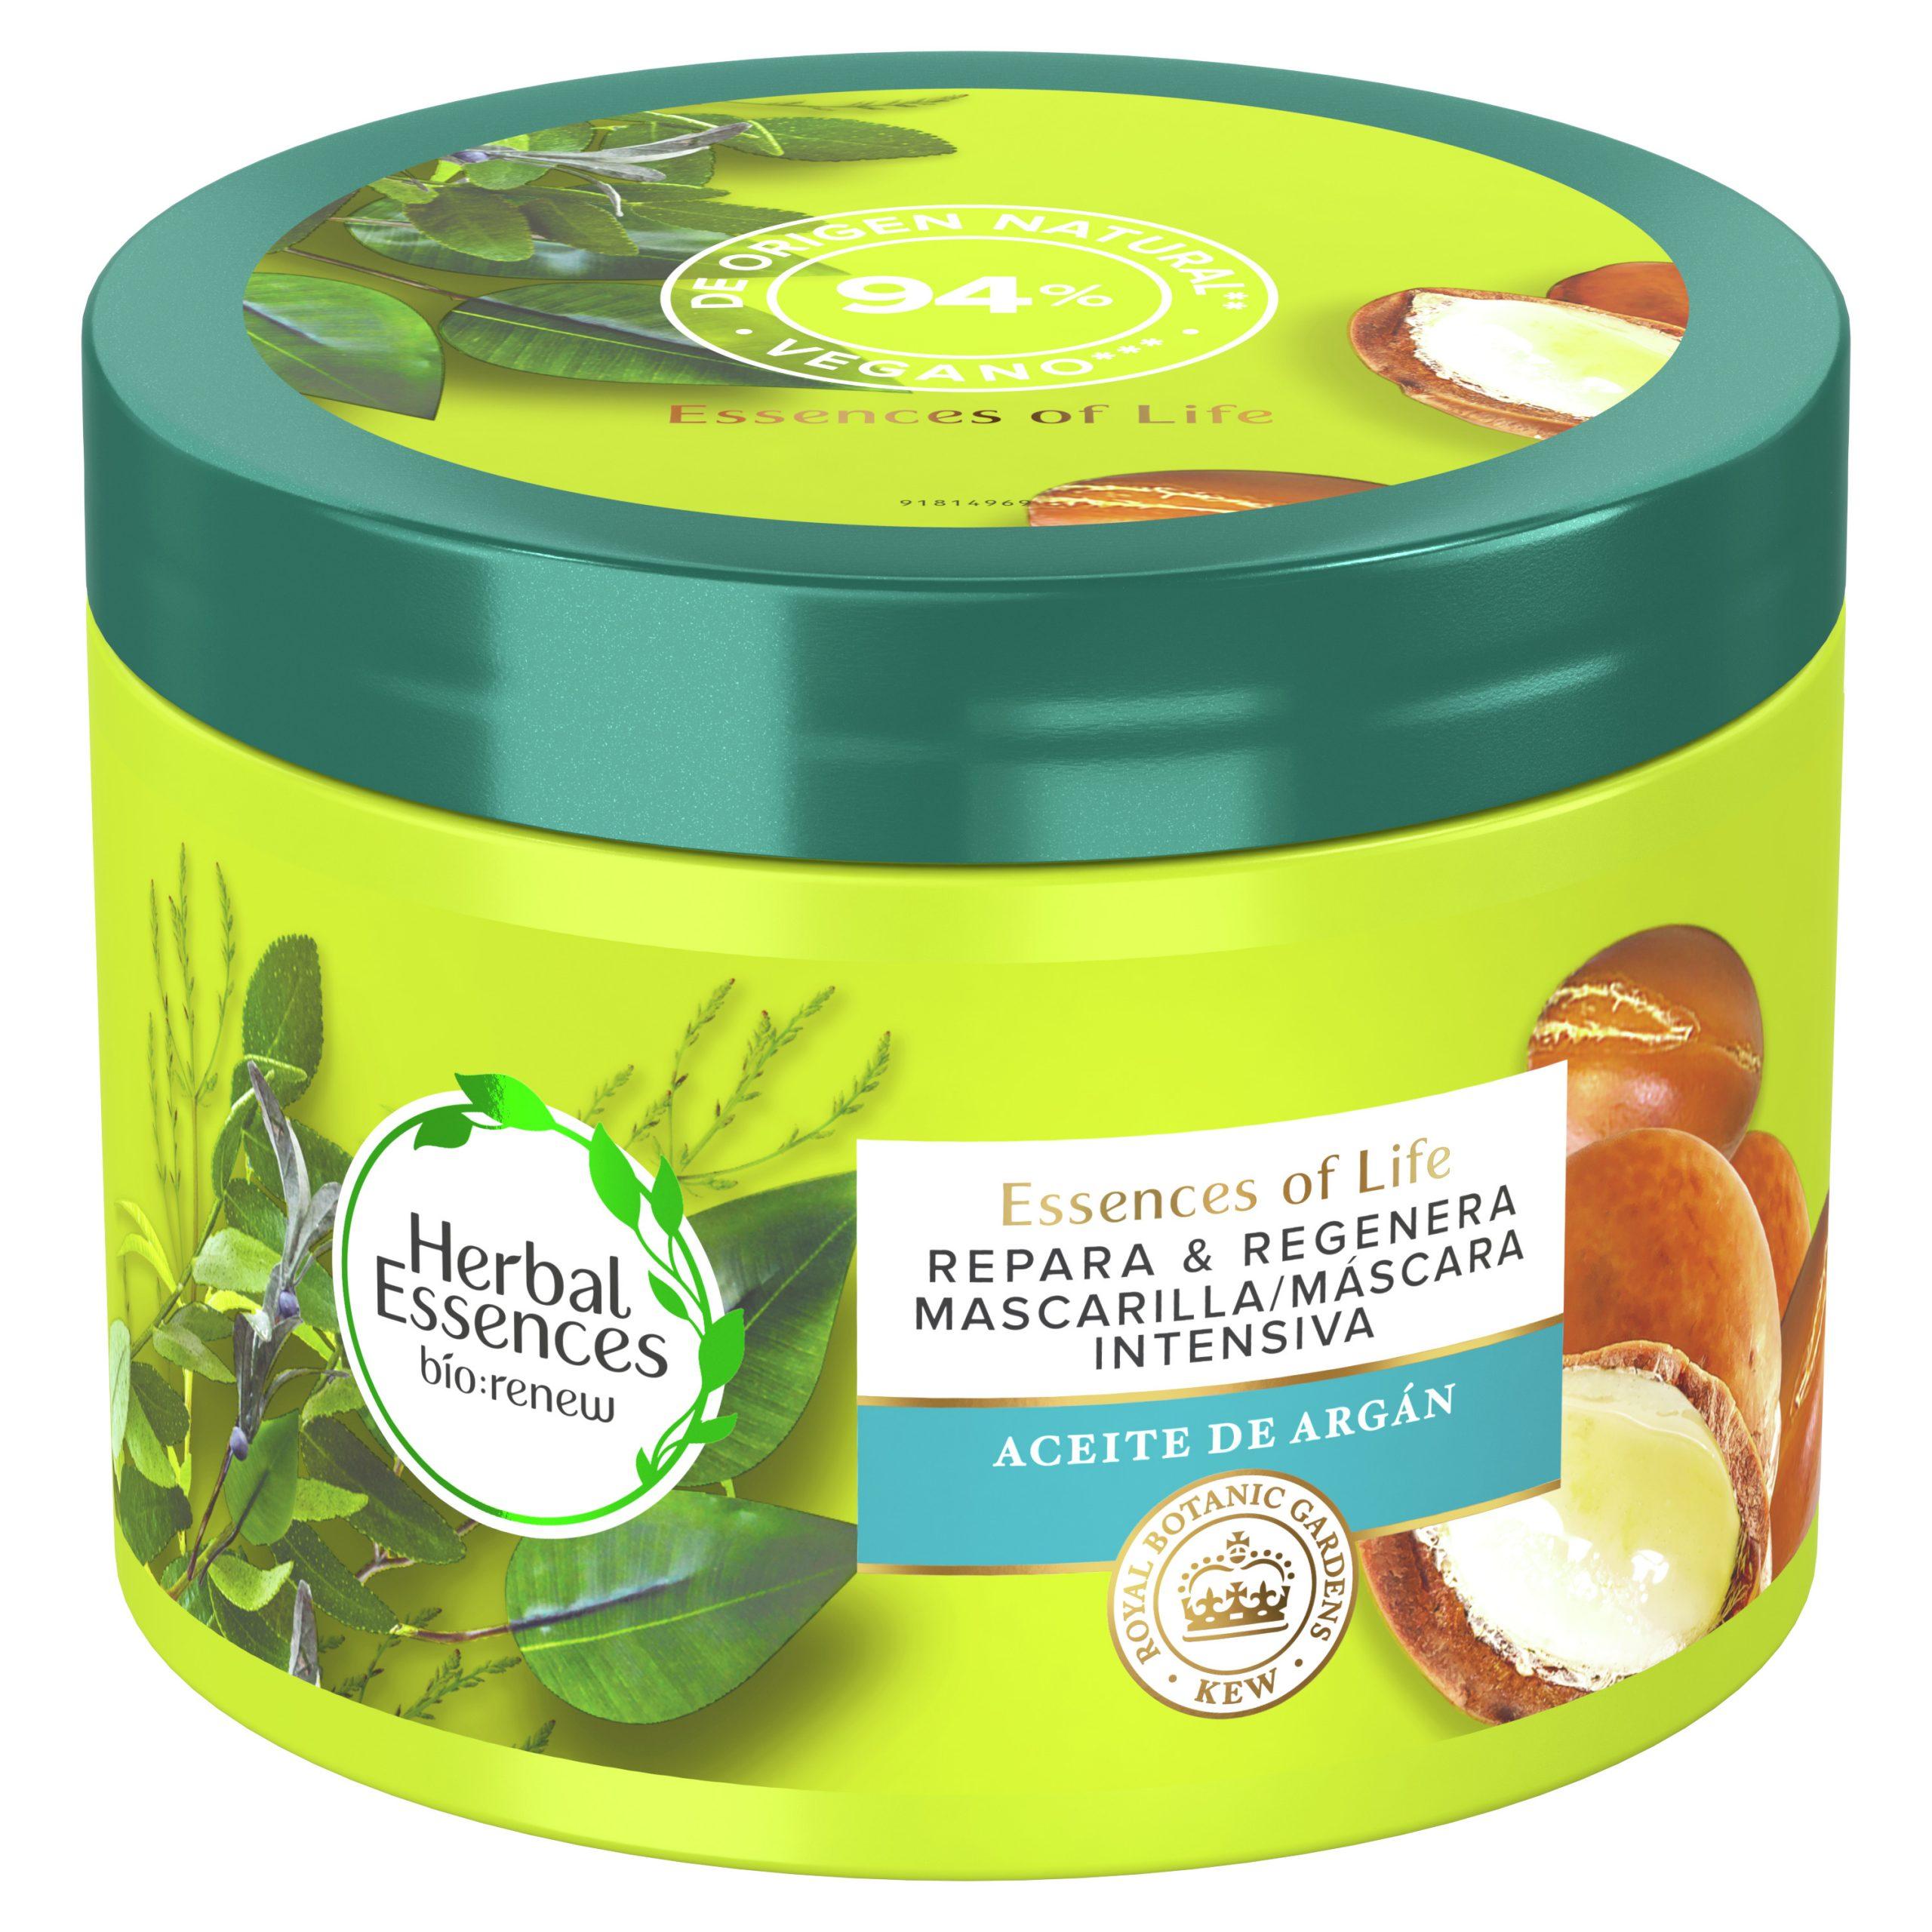 mascarilla Essences of Life de Herbal Essence